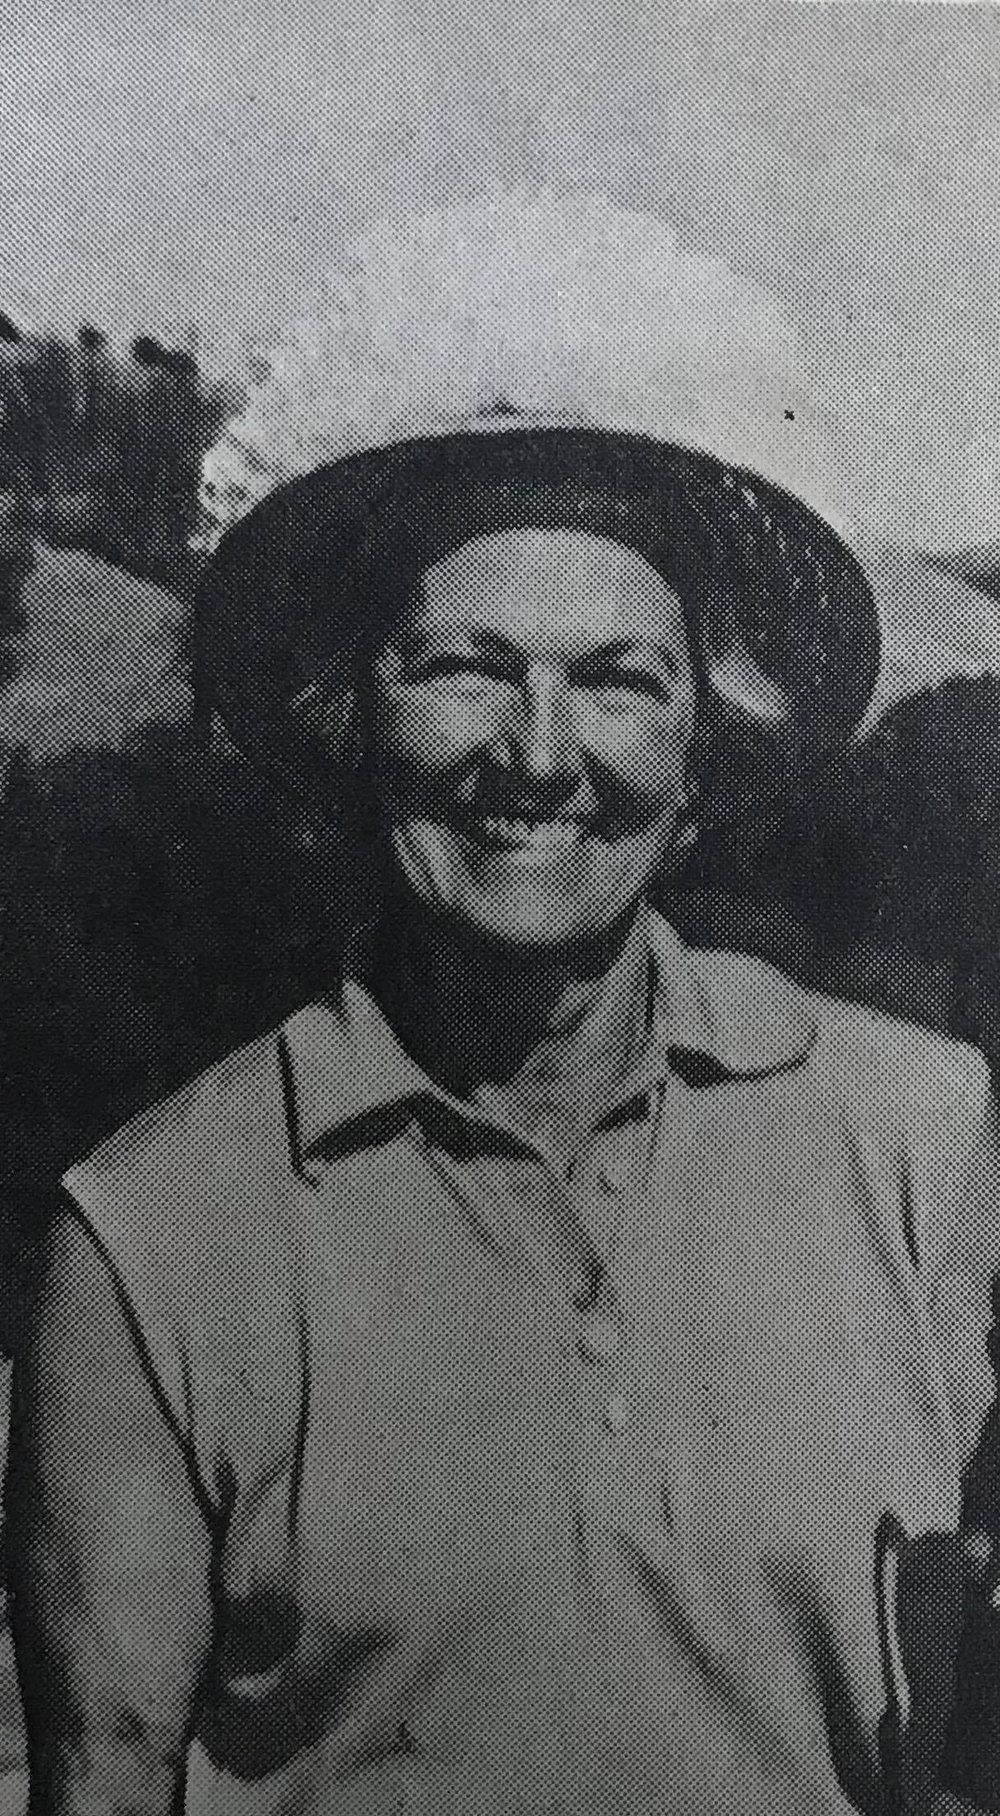 Doris Brooker, 1974 PWGA Tournament Chairman